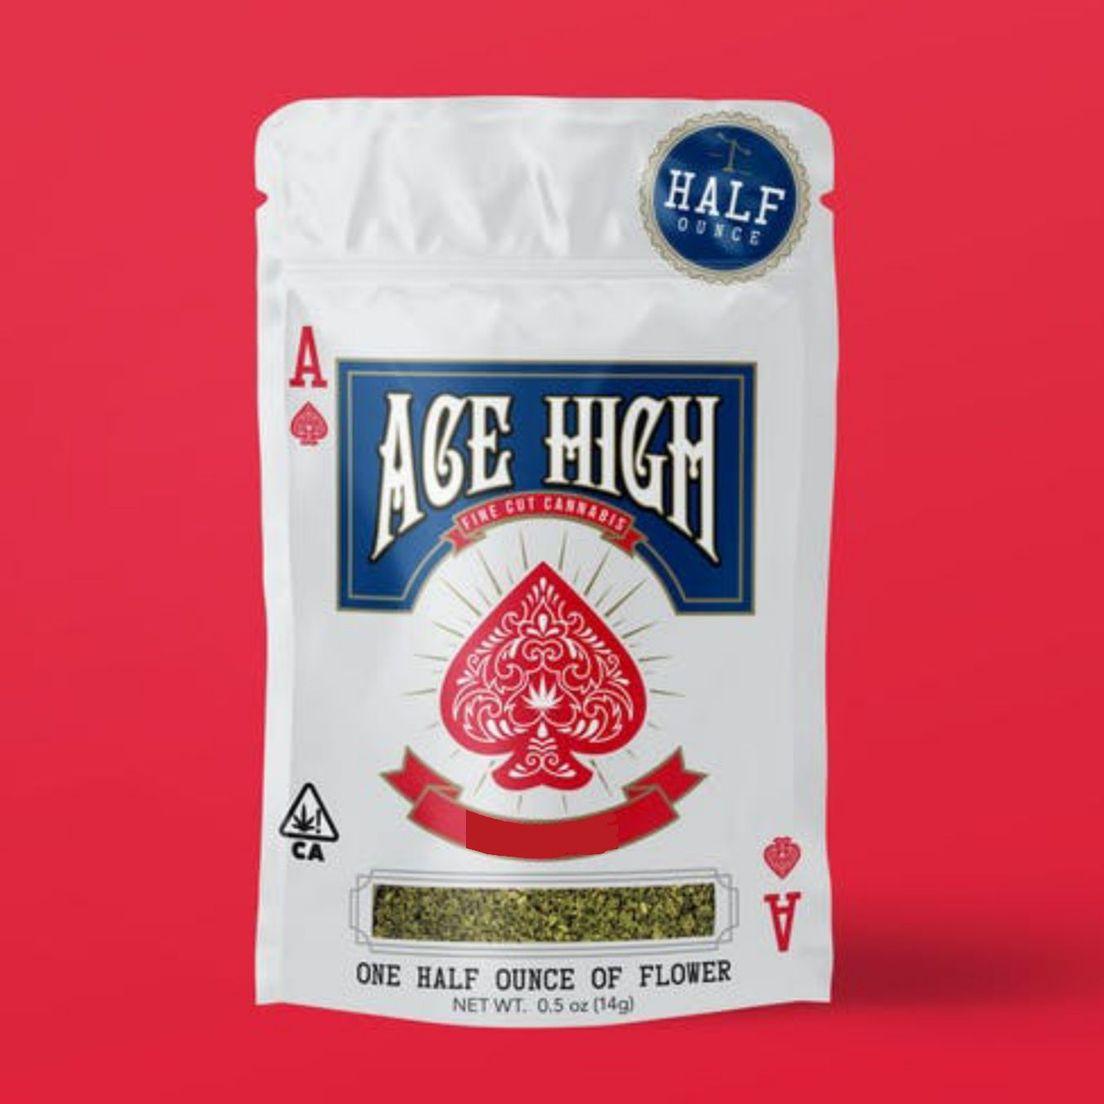 A. Ace High 14g Shake Flower - Sundae Driver (~17%)